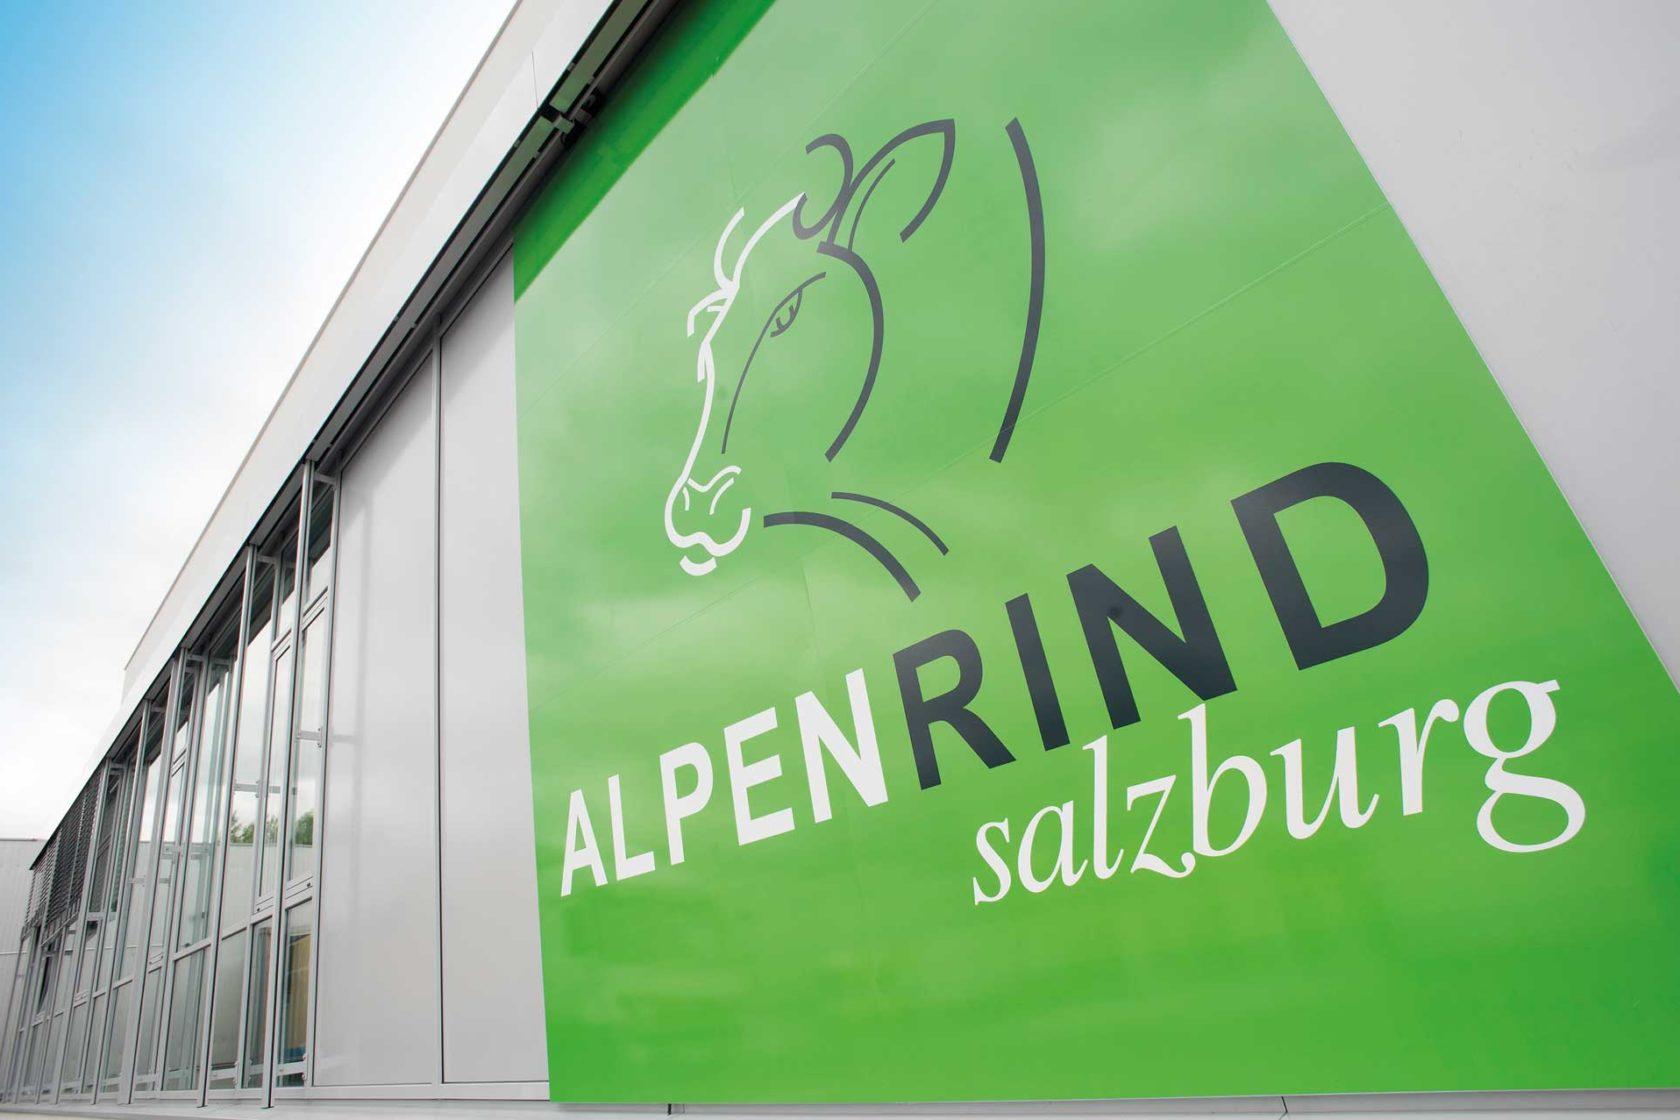 Alpenrind Company building - Standort Salzburg